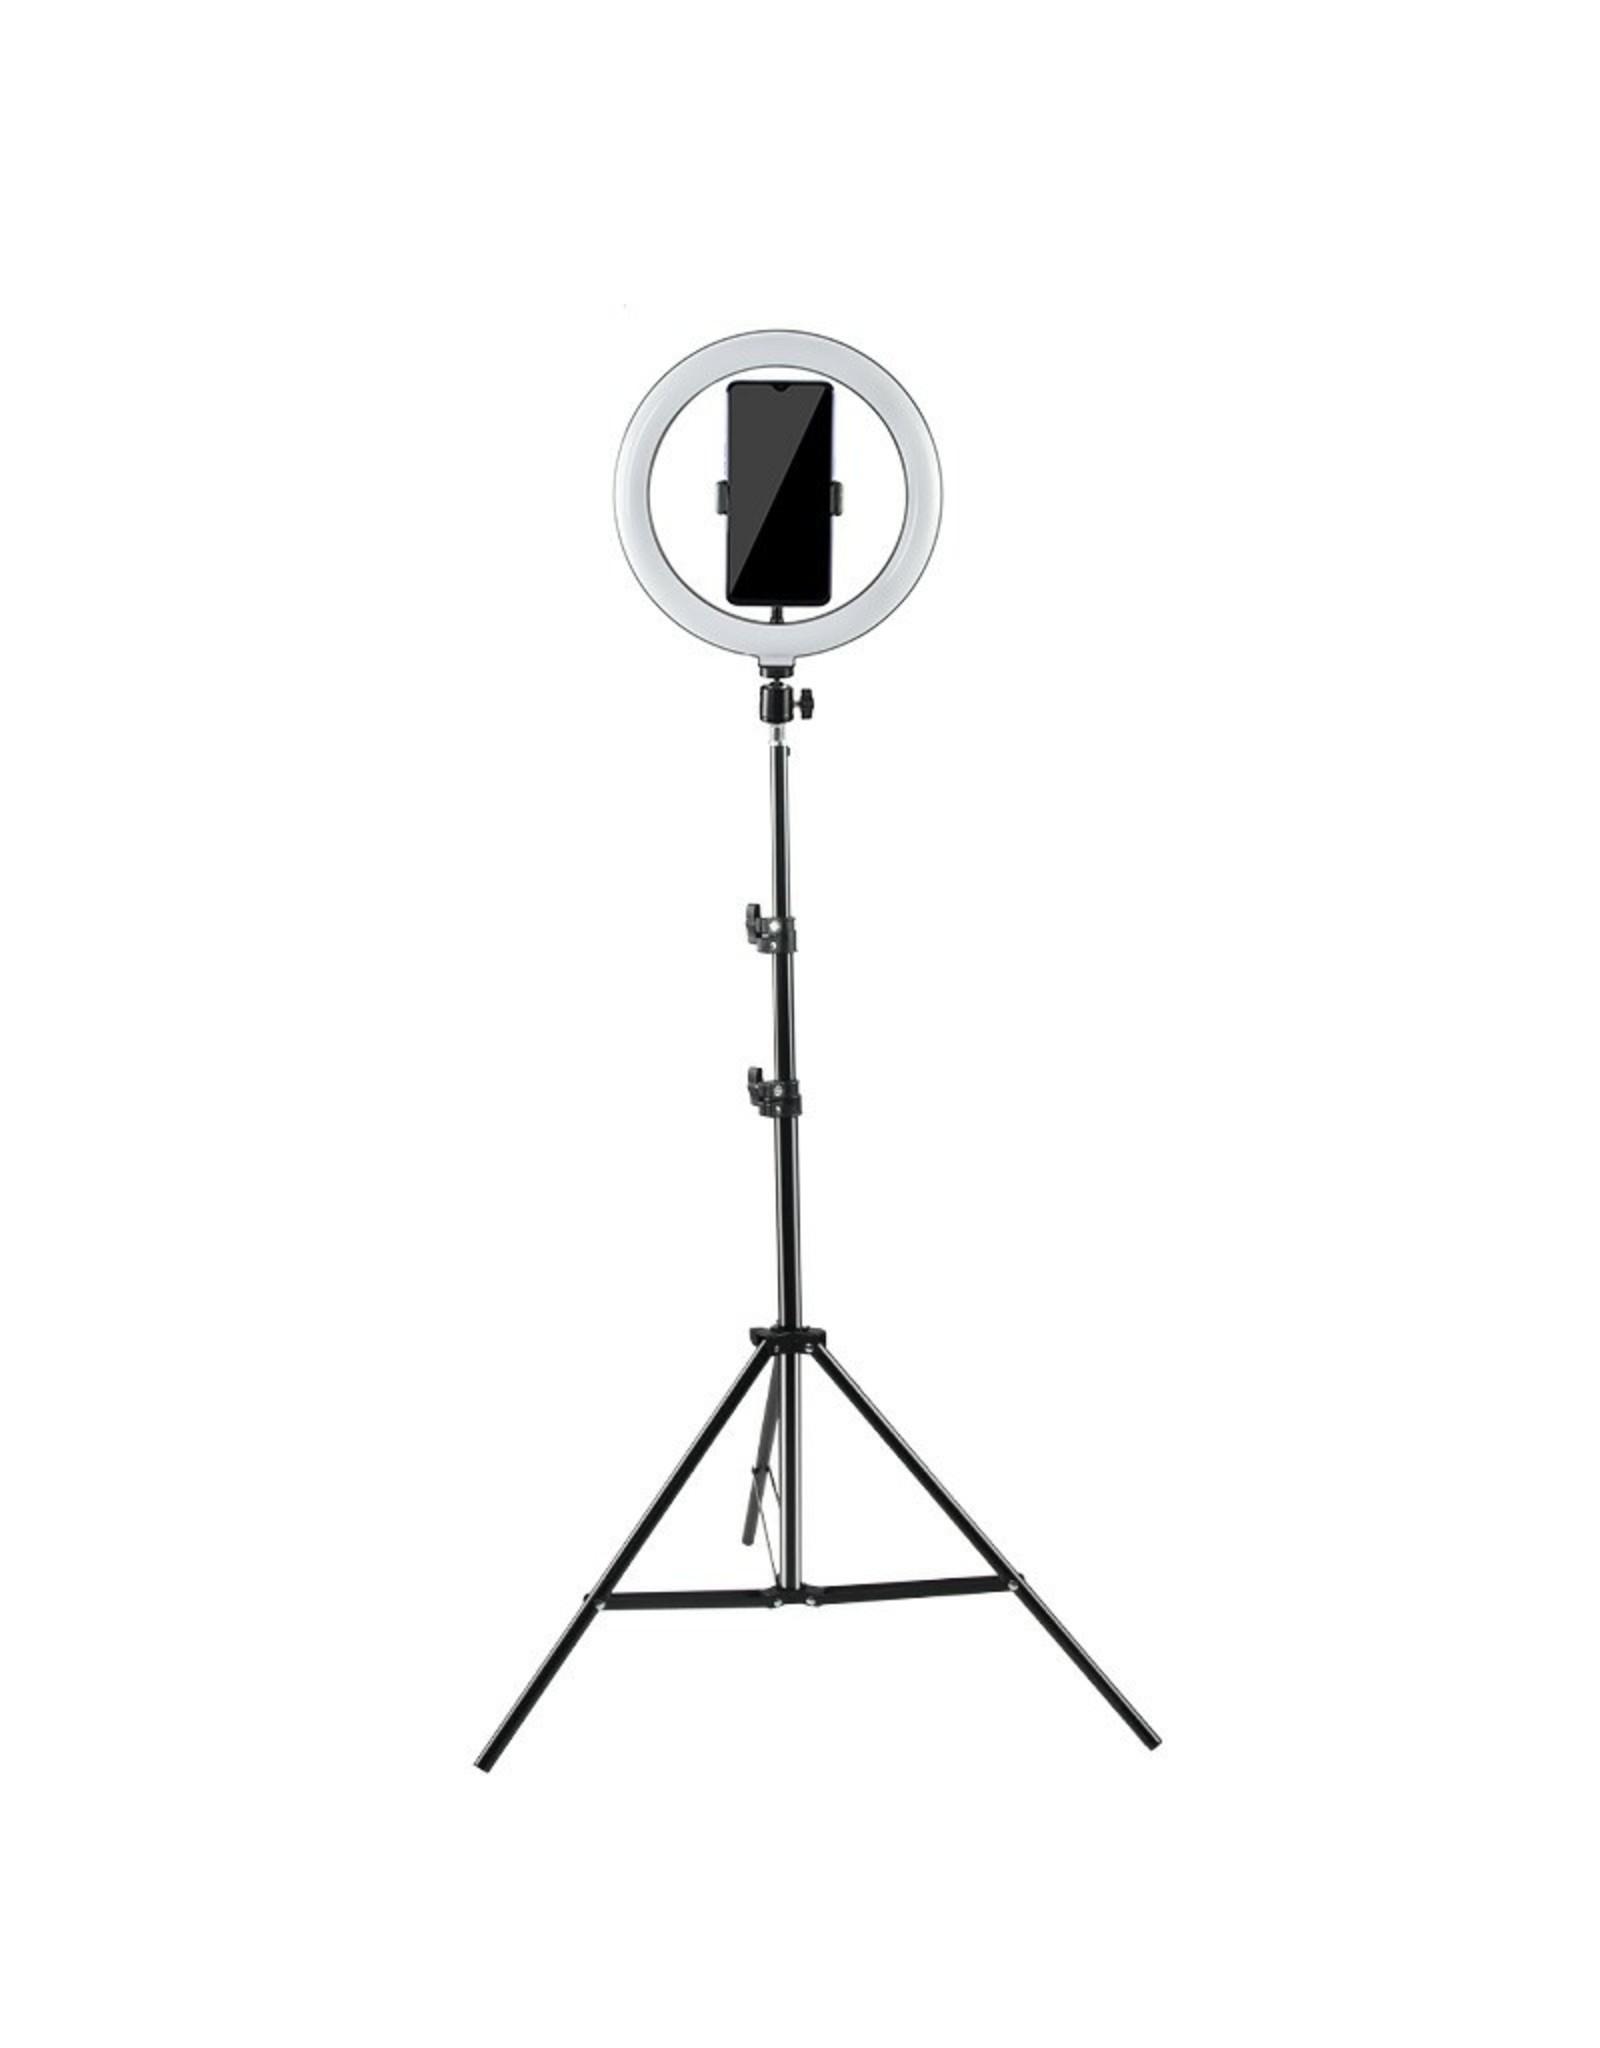 Parya Official Parya Official -  Ringlight Lamp - Met Statief - 70-200 cm